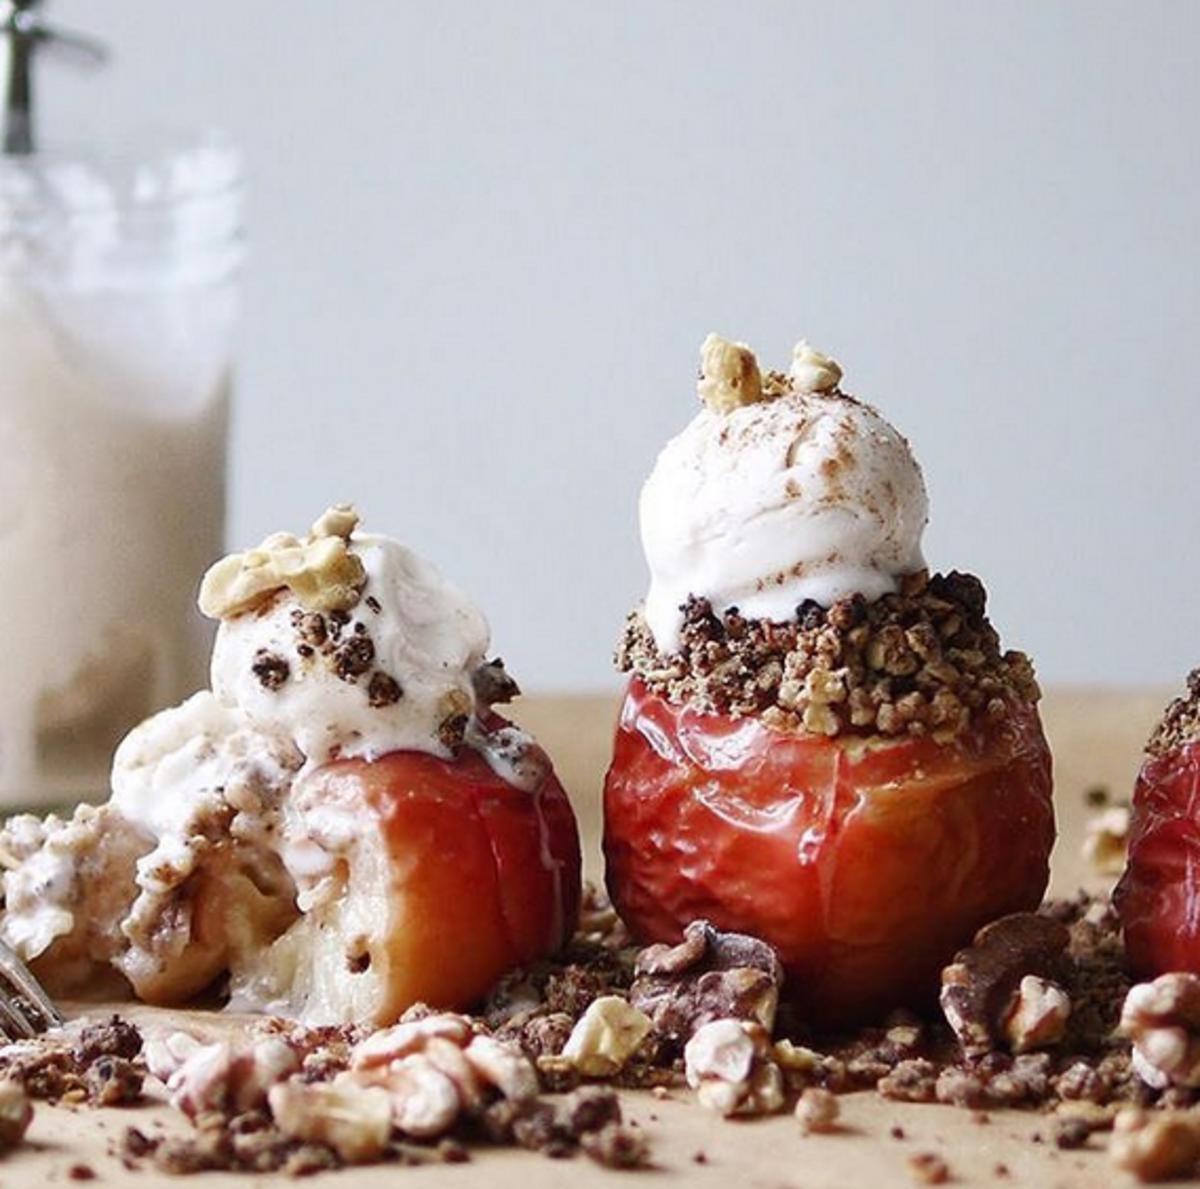 Healthy snacks, Coconut Bliss